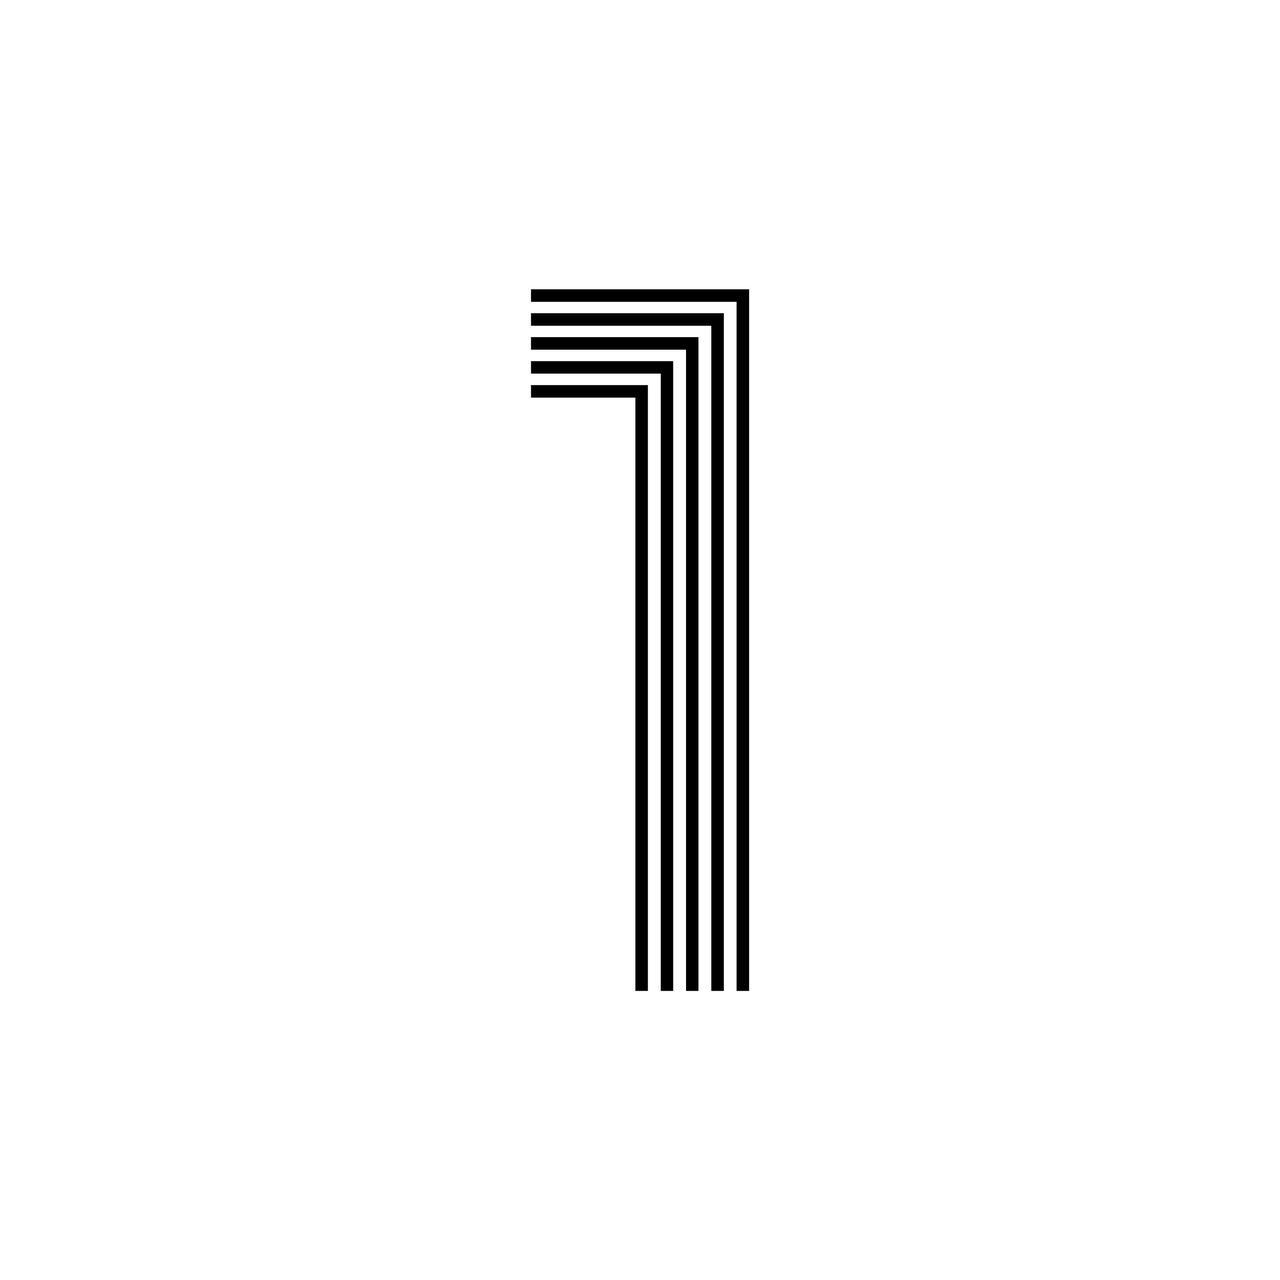 Gen0 Highscore #1 - Isaacfufu